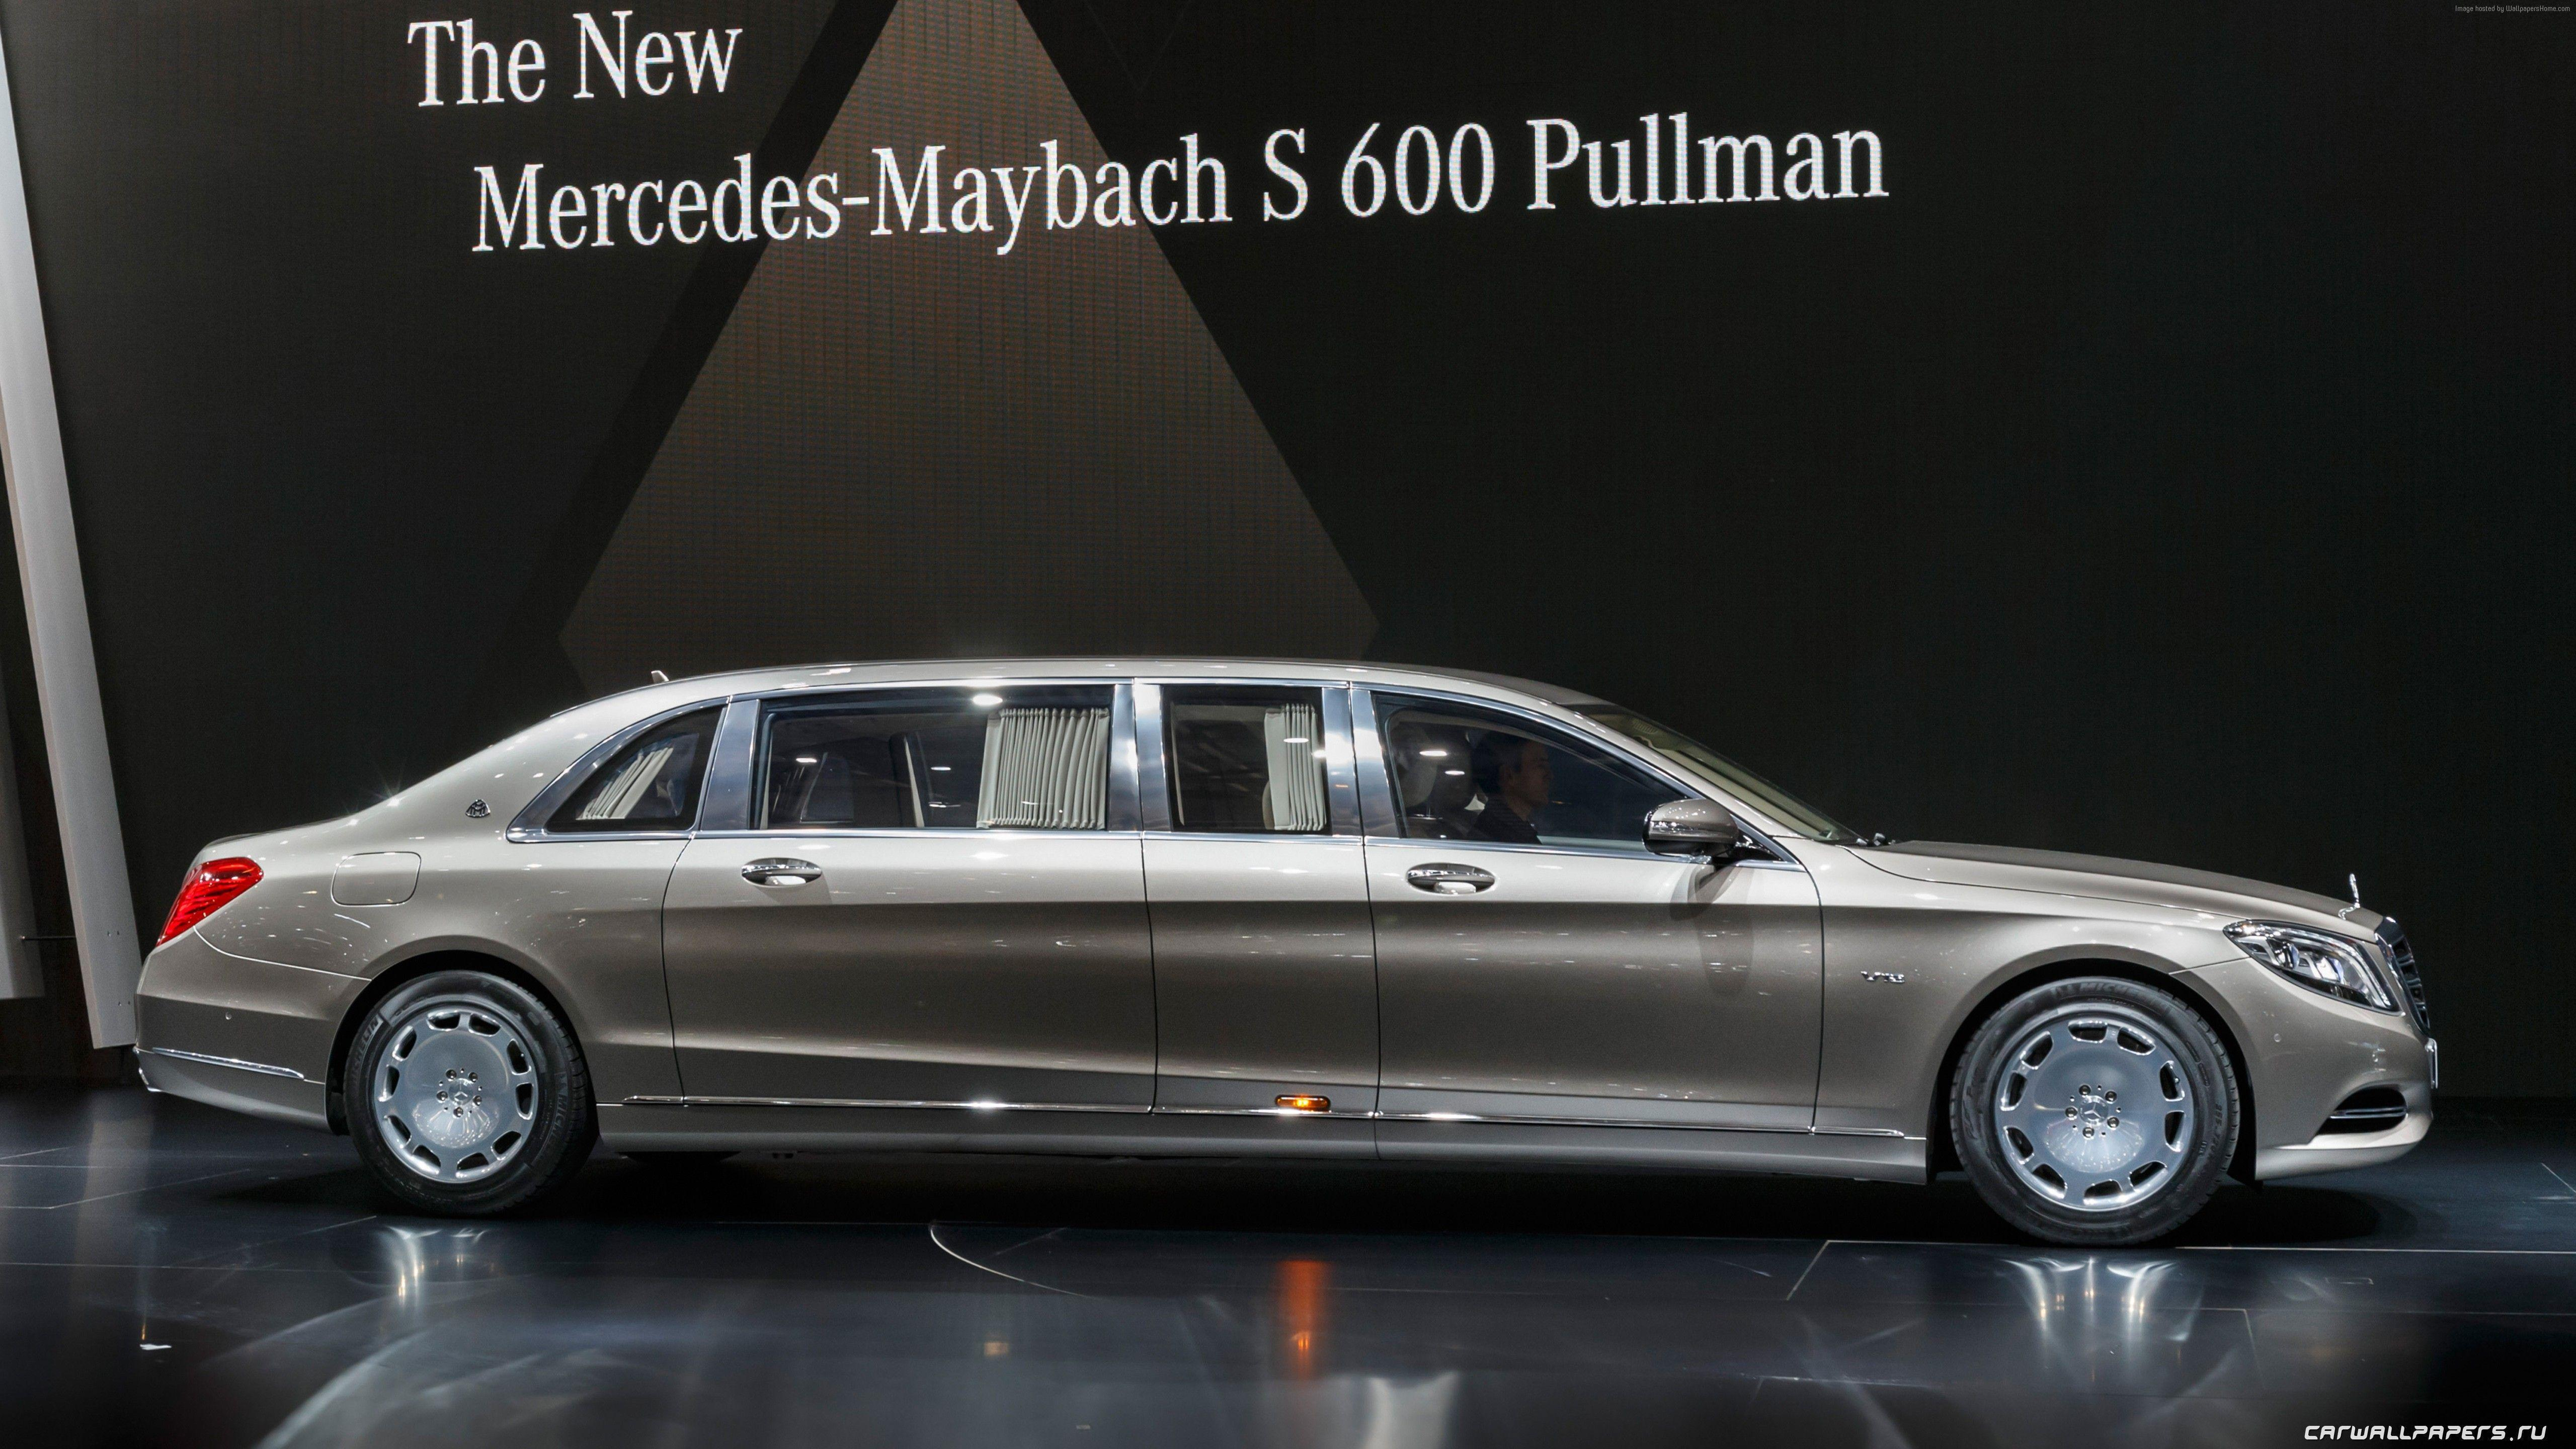 mercedes-maybach s600 sedan wallpapers - wallpaper cave